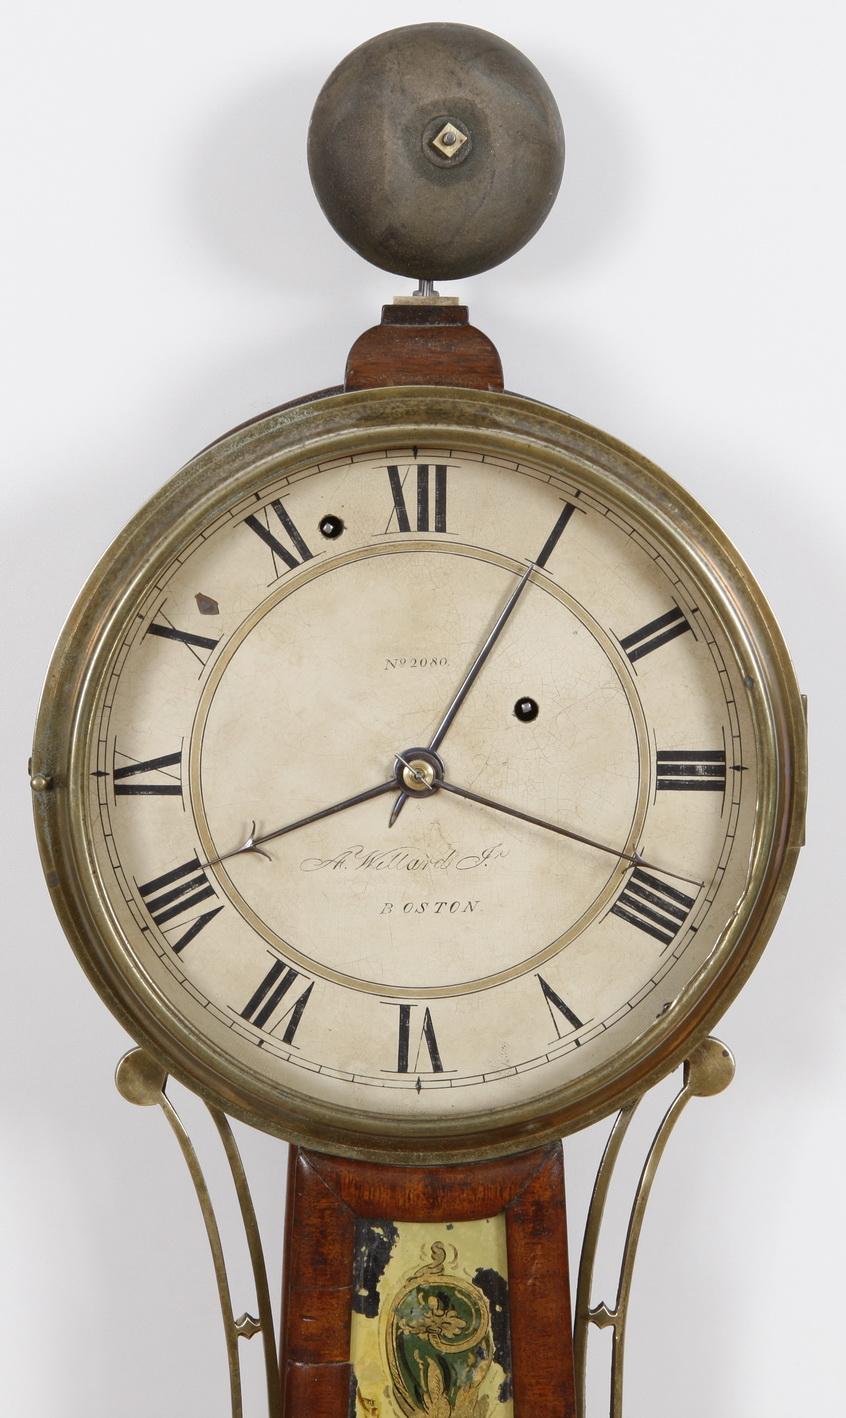 Tablet Alarm Clock